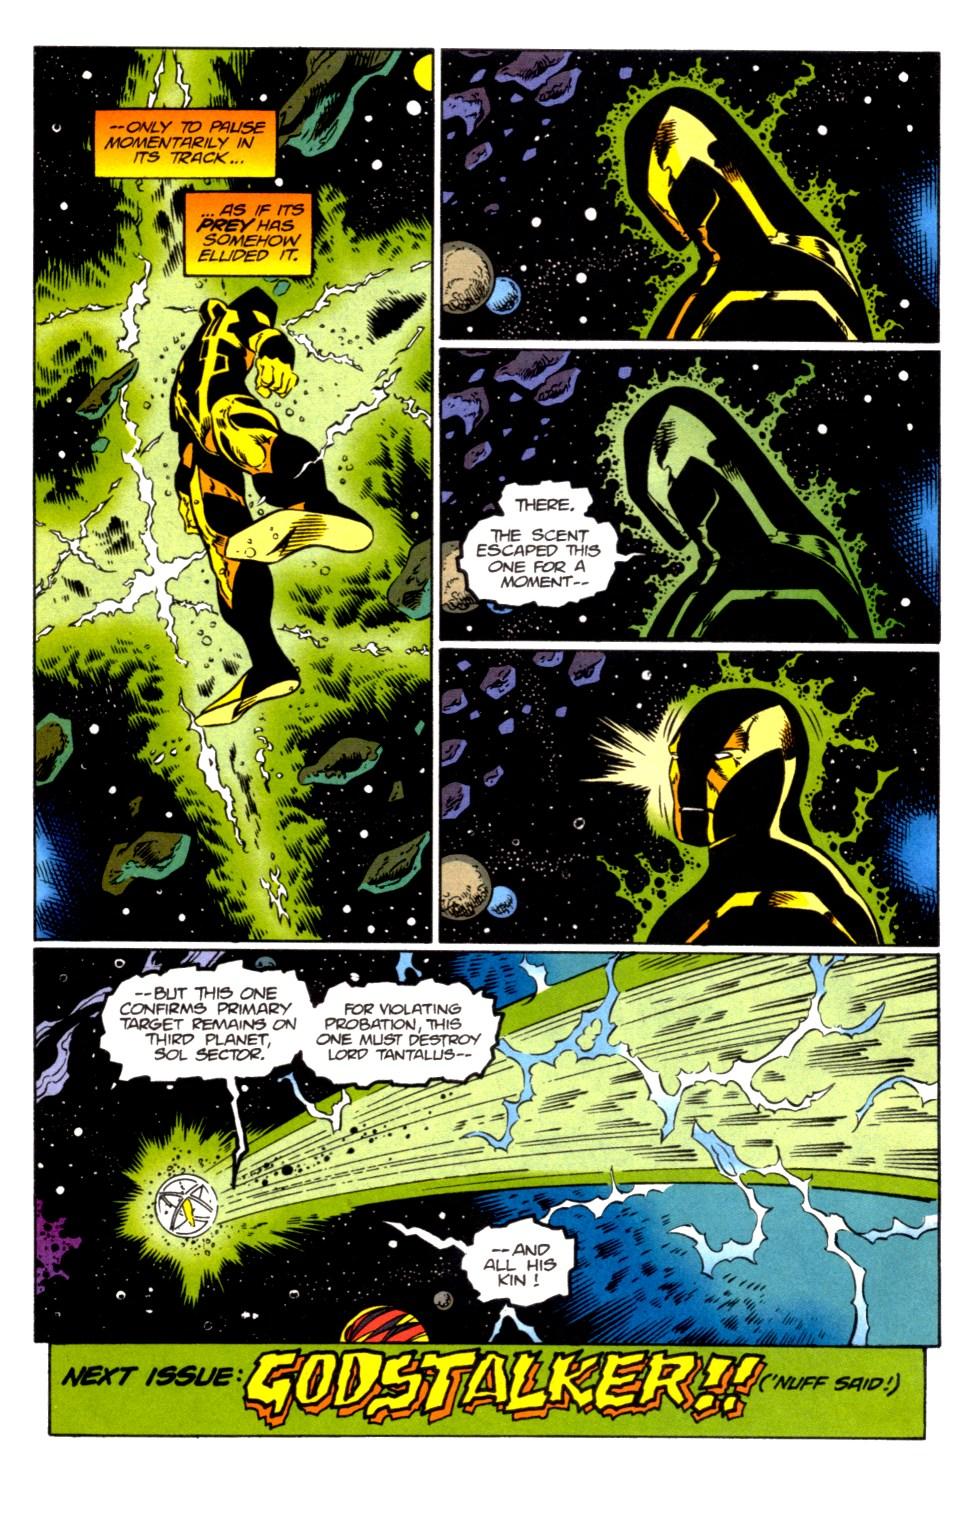 Read online Blackwulf comic -  Issue #6 - 15